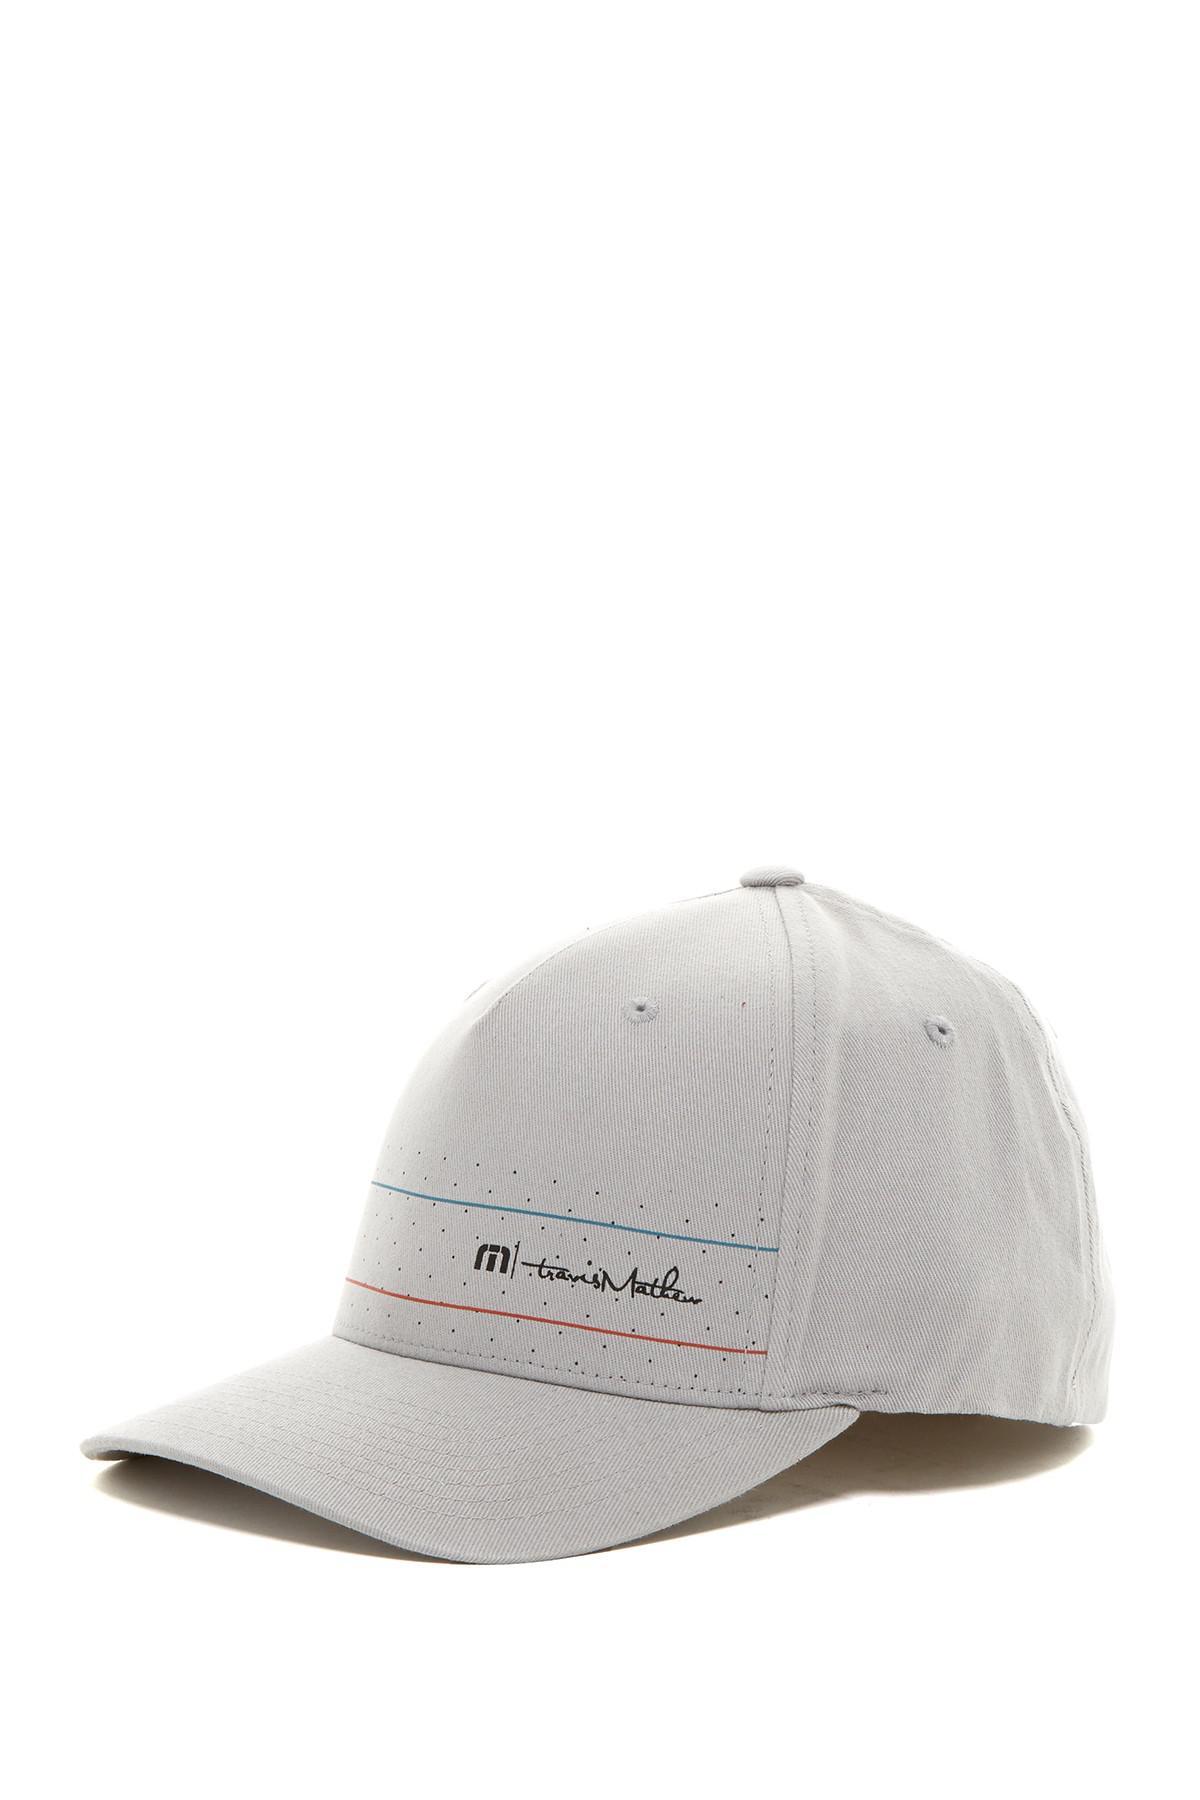 Travis mathew Blair Hat in Gray for Men  84dae7f1e4da